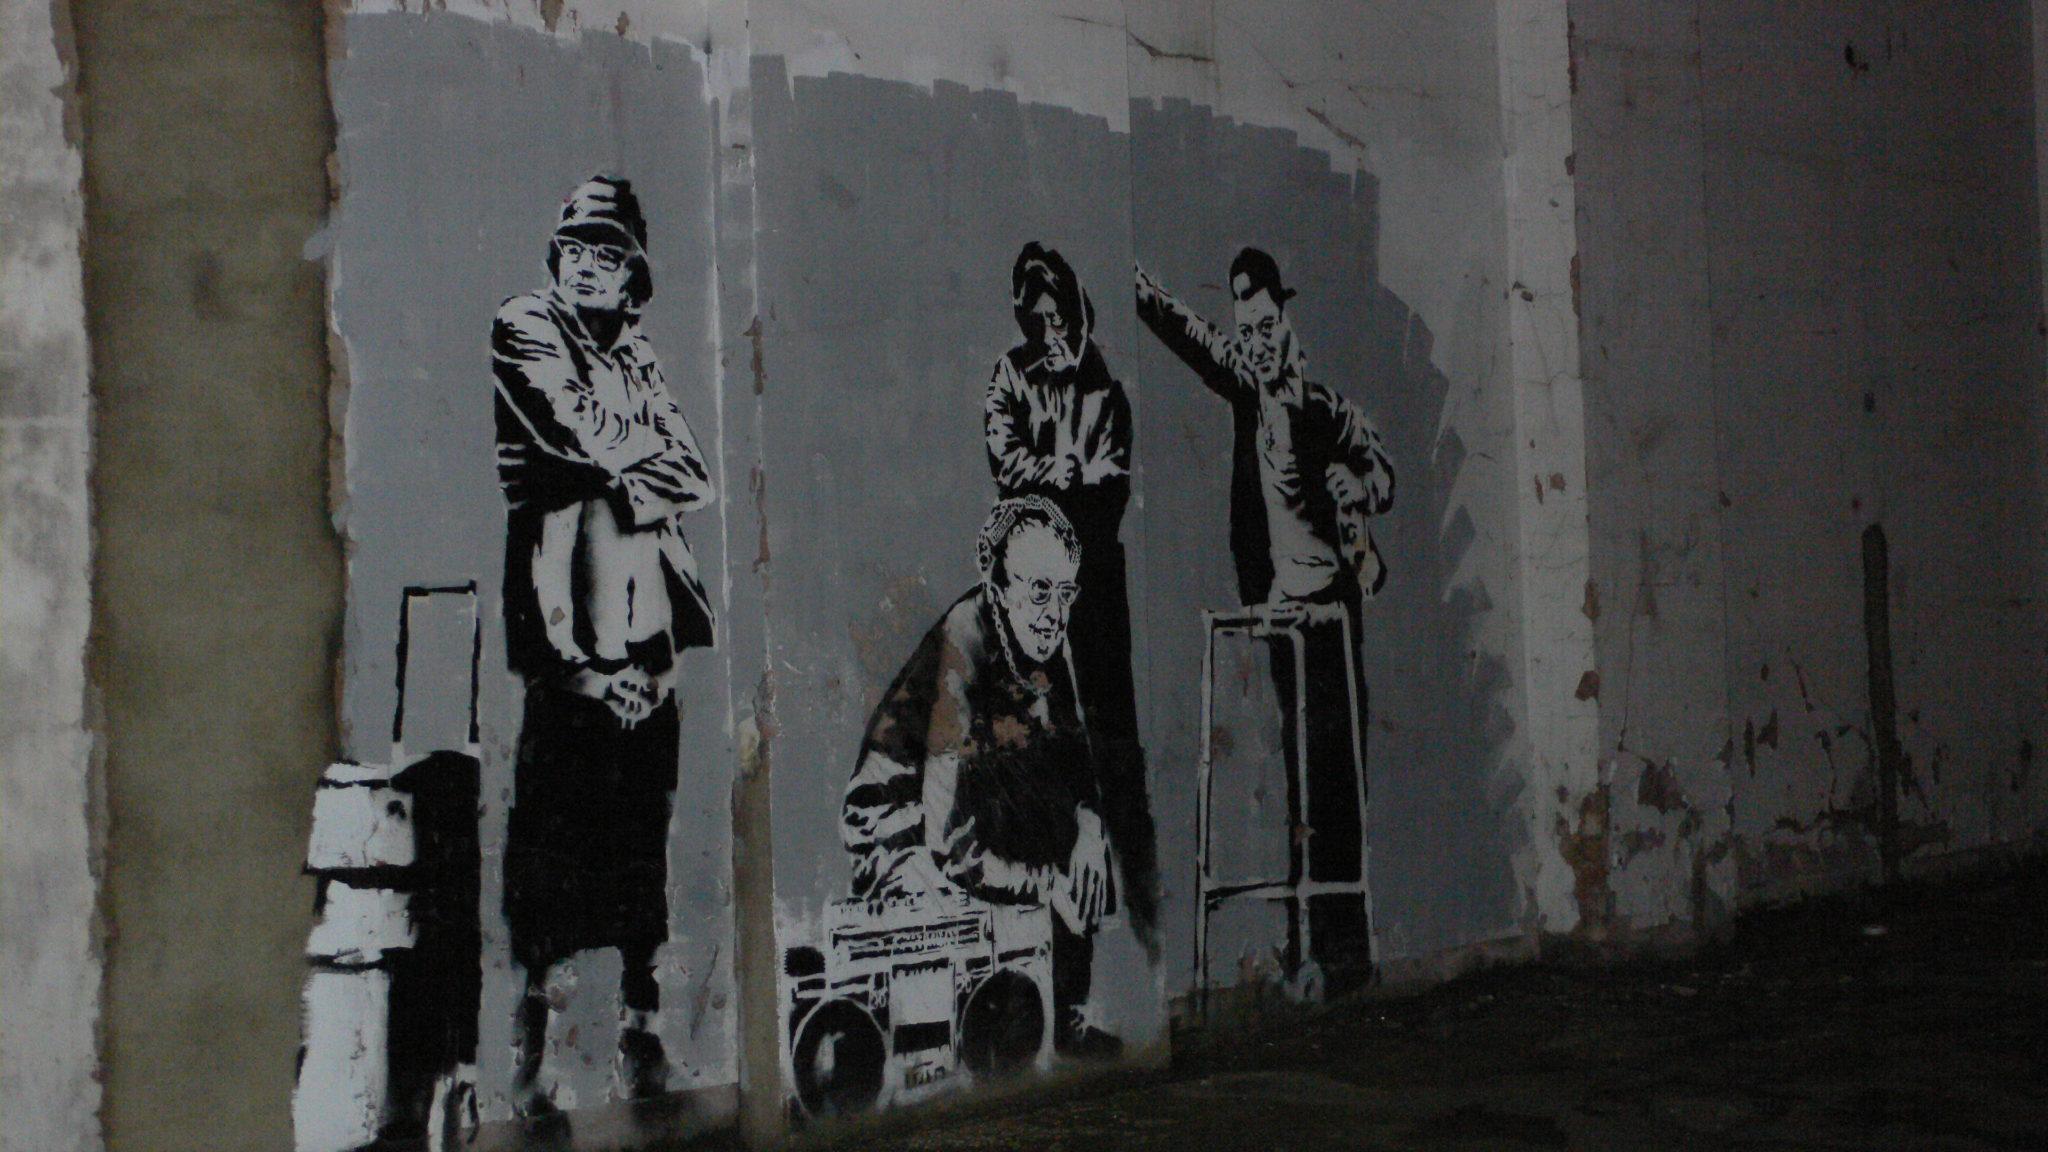 Graffiti autorstwa Banksy'iego, Clerkenwell, Londyn